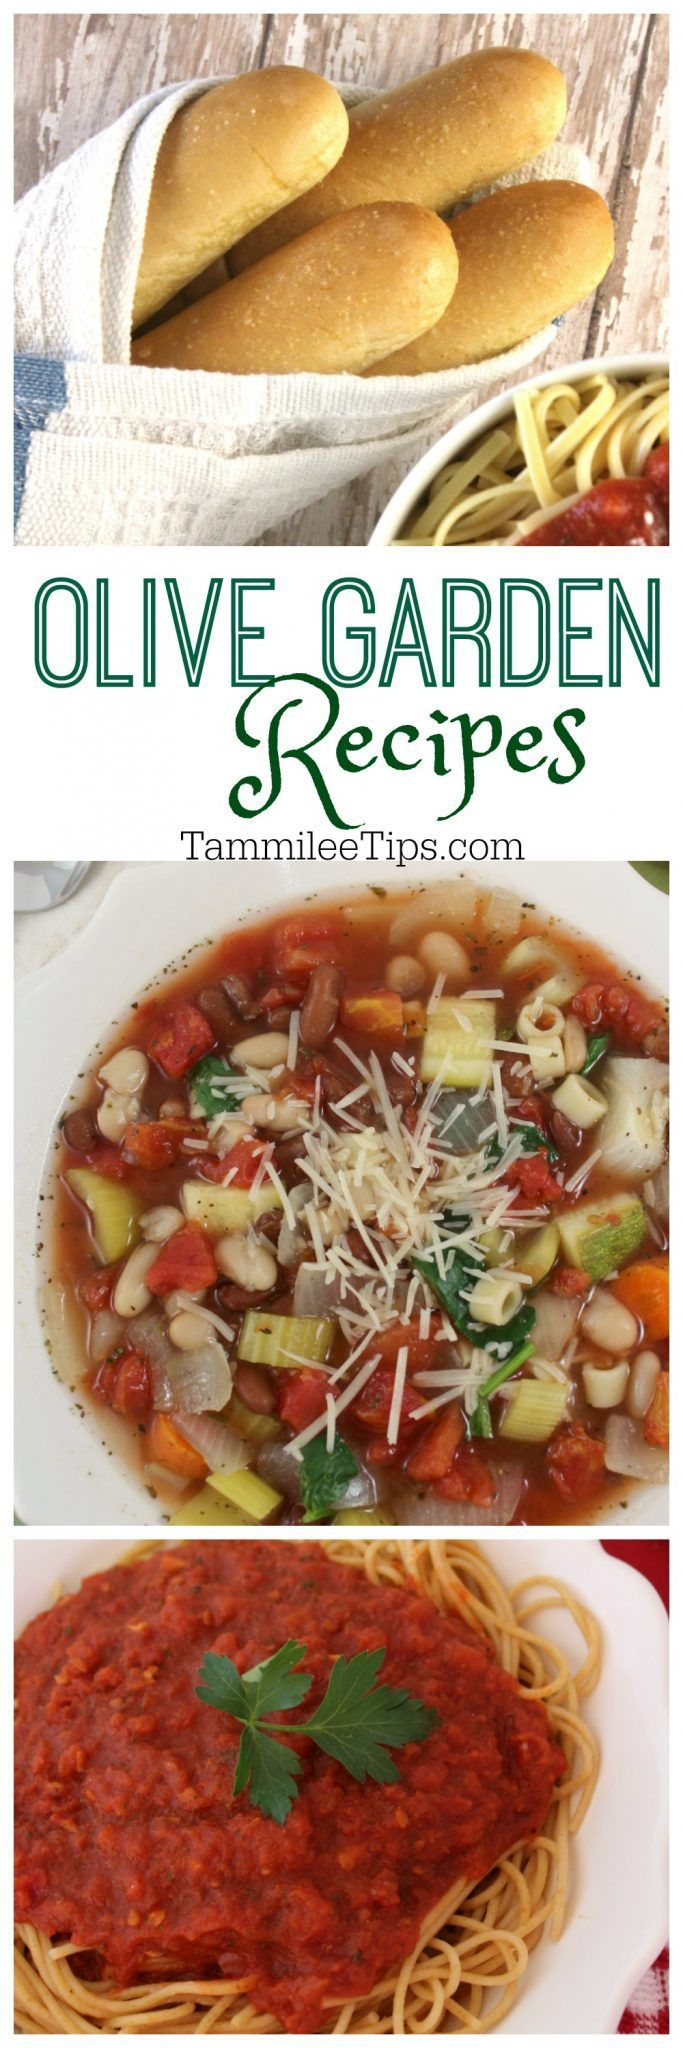 Olive Garden Recipes Best Olive Garden Soups Marinara Sauce And Olive Gardens Ideas